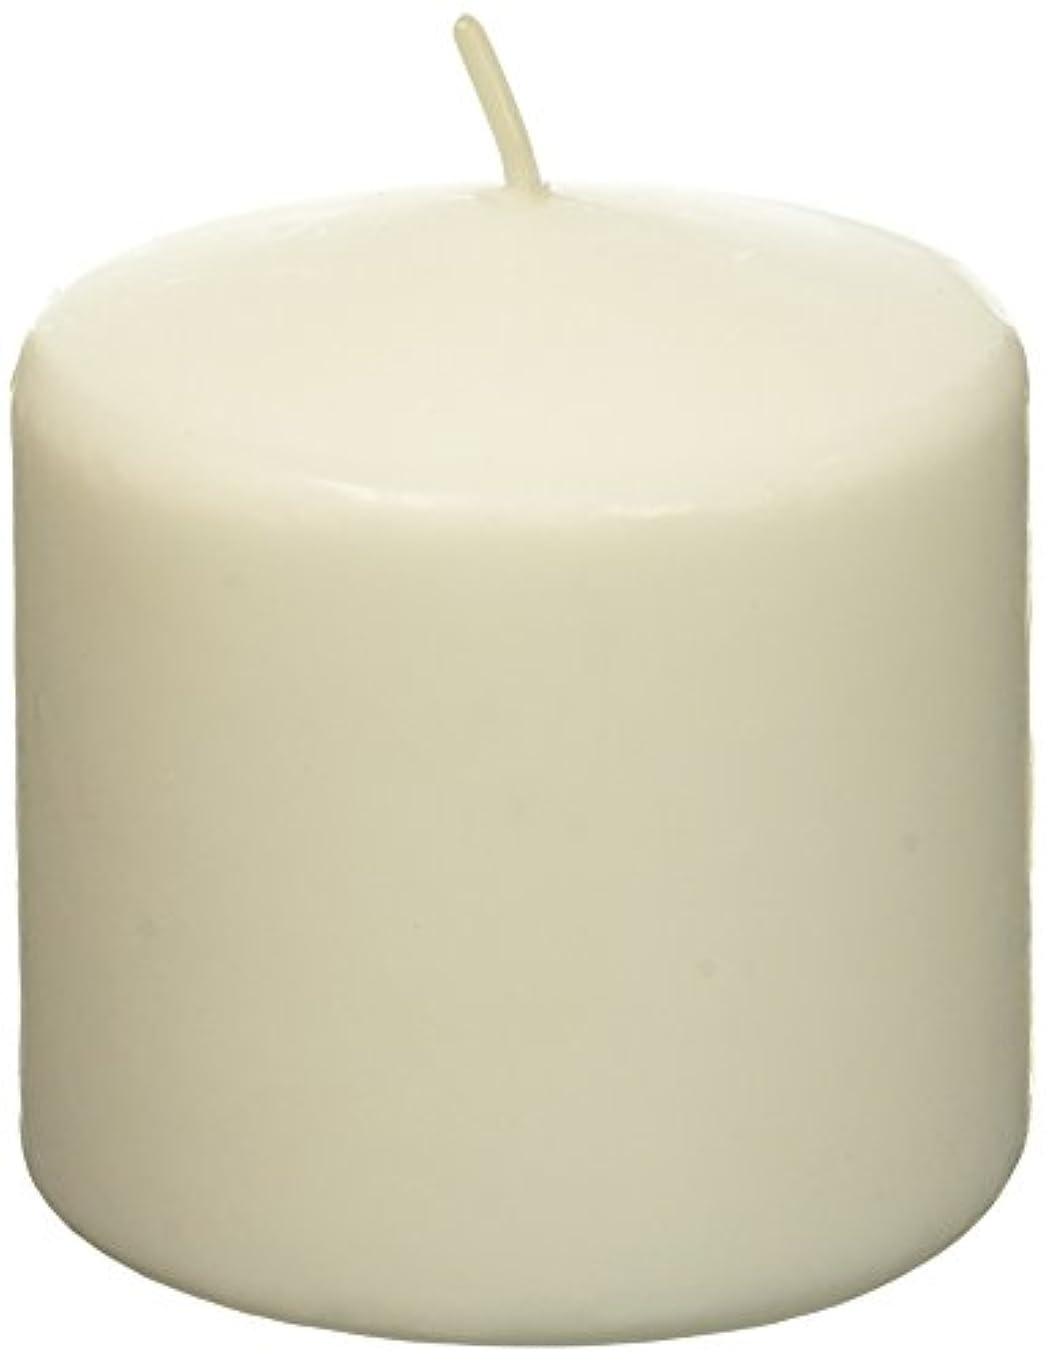 共産主義再生的狂ったZest Candle CPZ-007-12 3 x 3 in. White Pillar Candles -12pcs-Case- Bulk